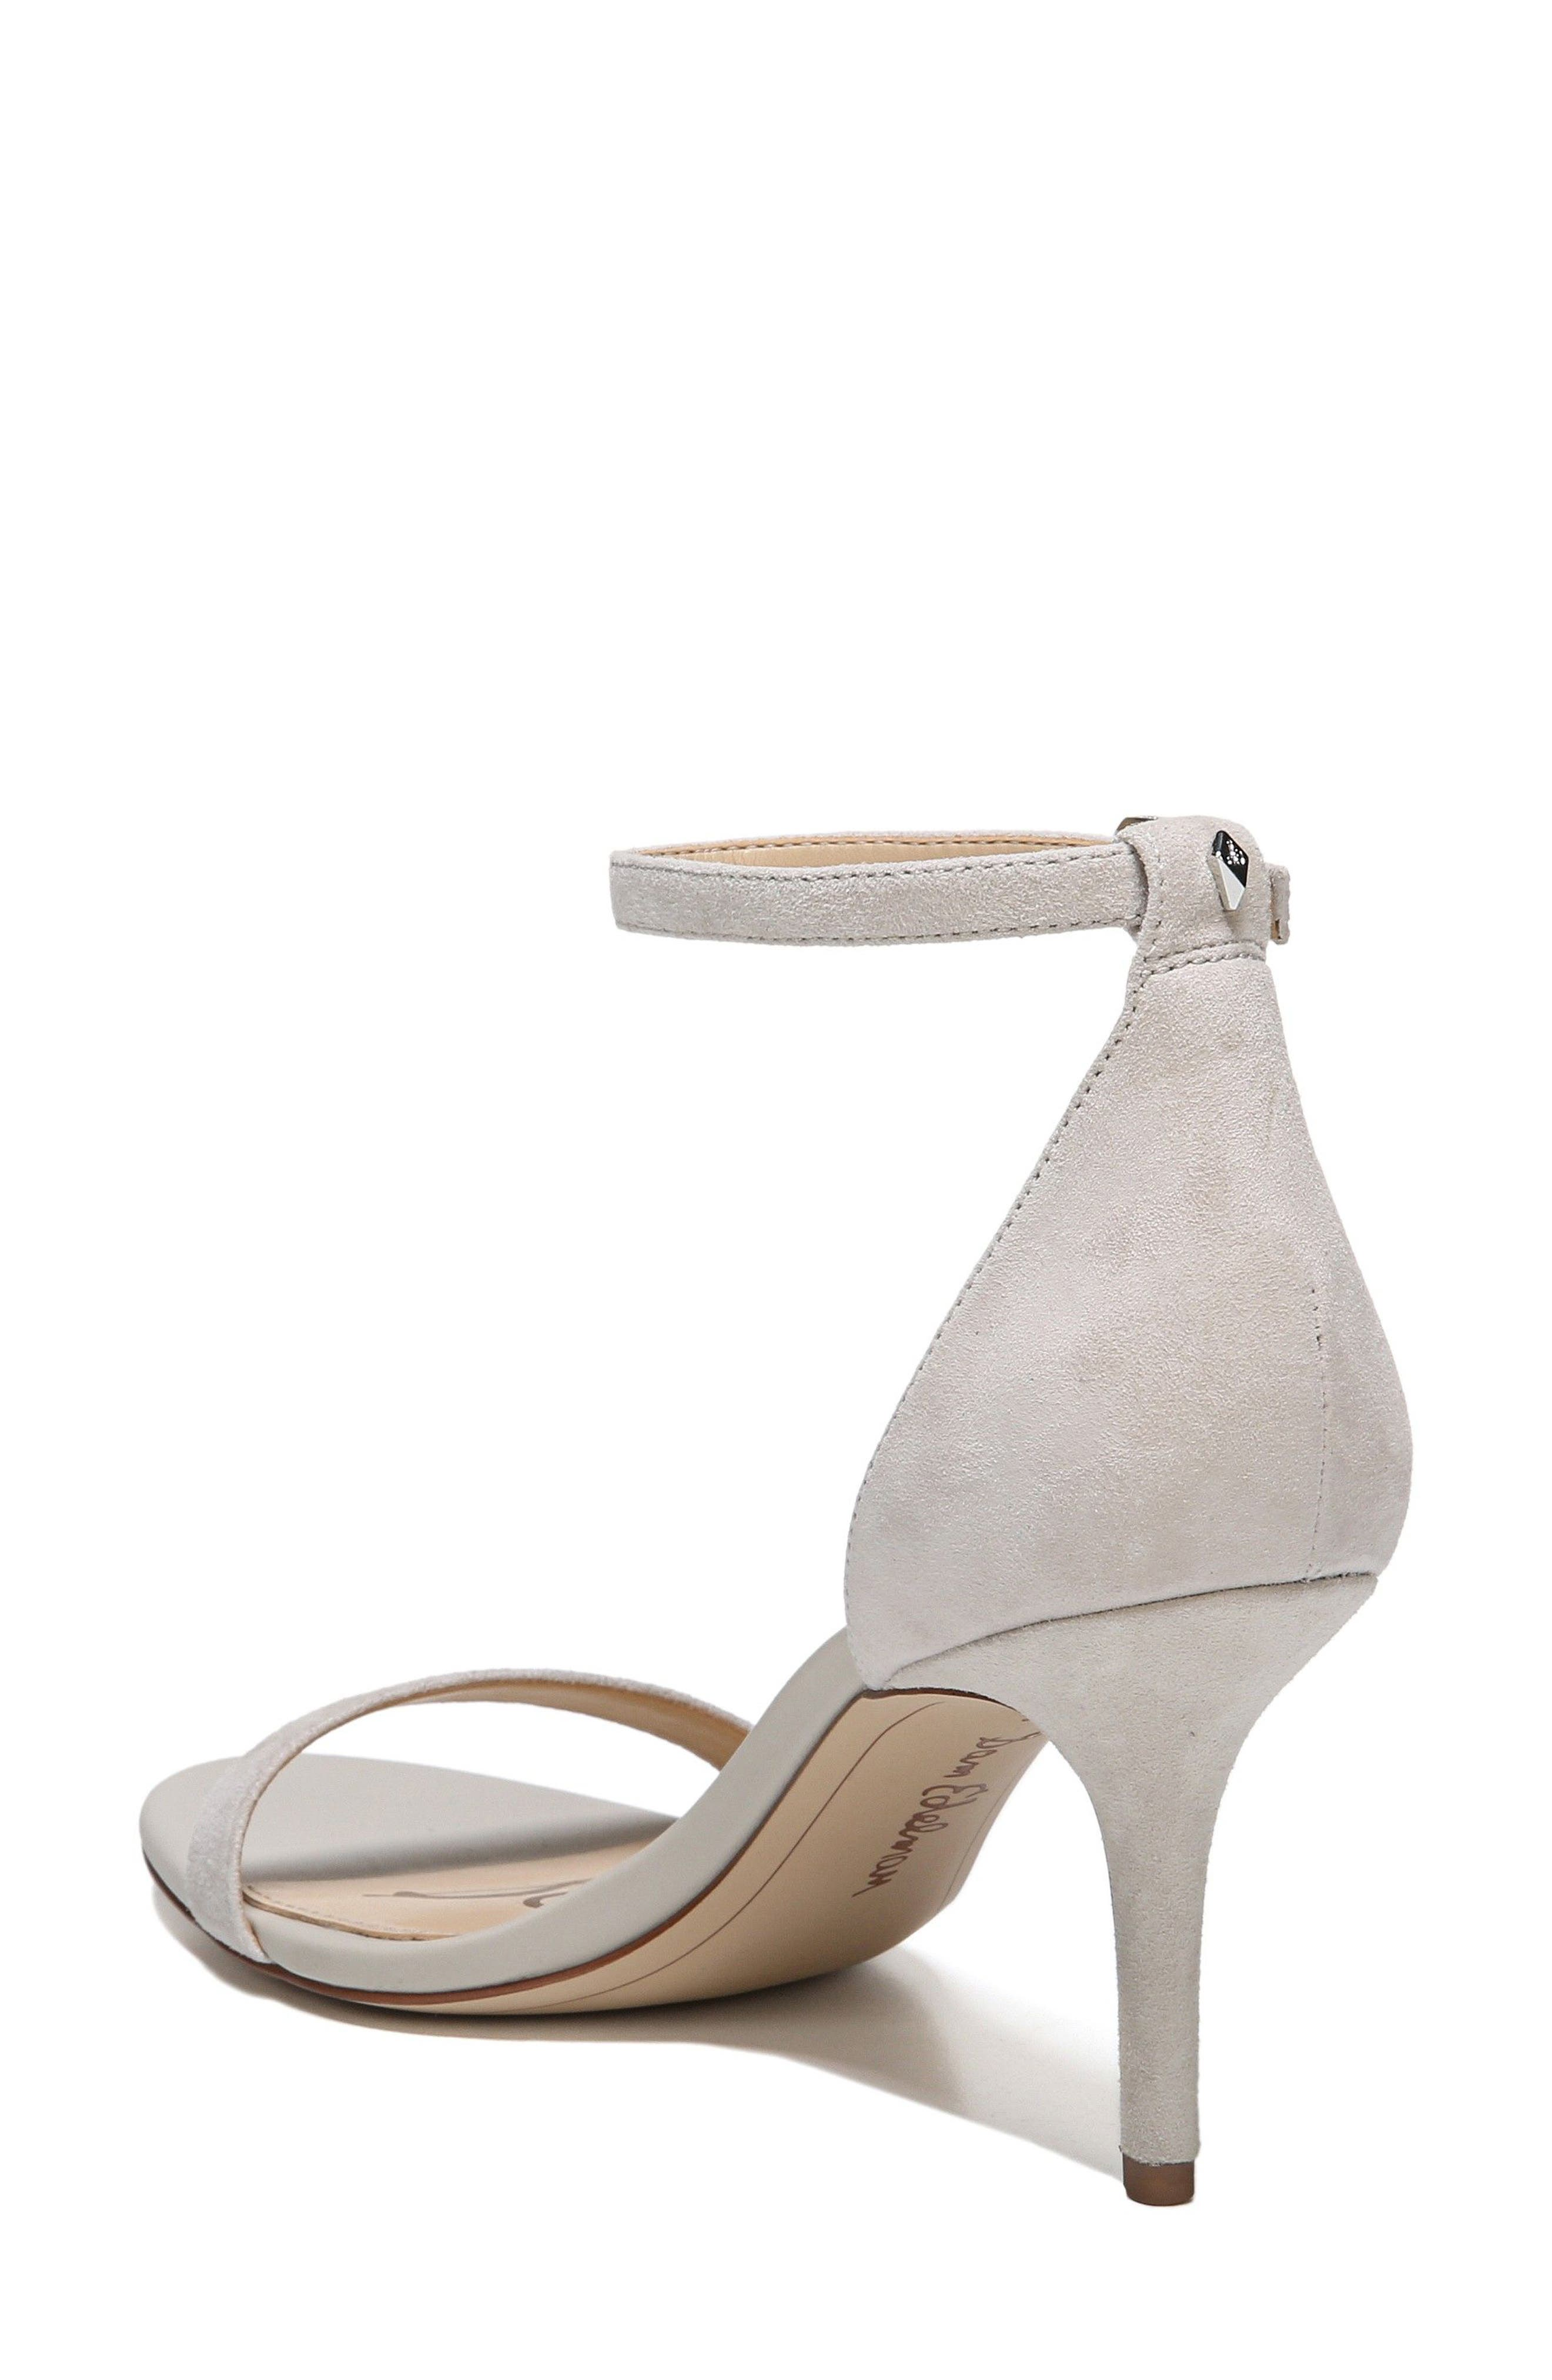 ,                             'Patti' Ankle Strap Sandal,                             Alternate thumbnail 157, color,                             021